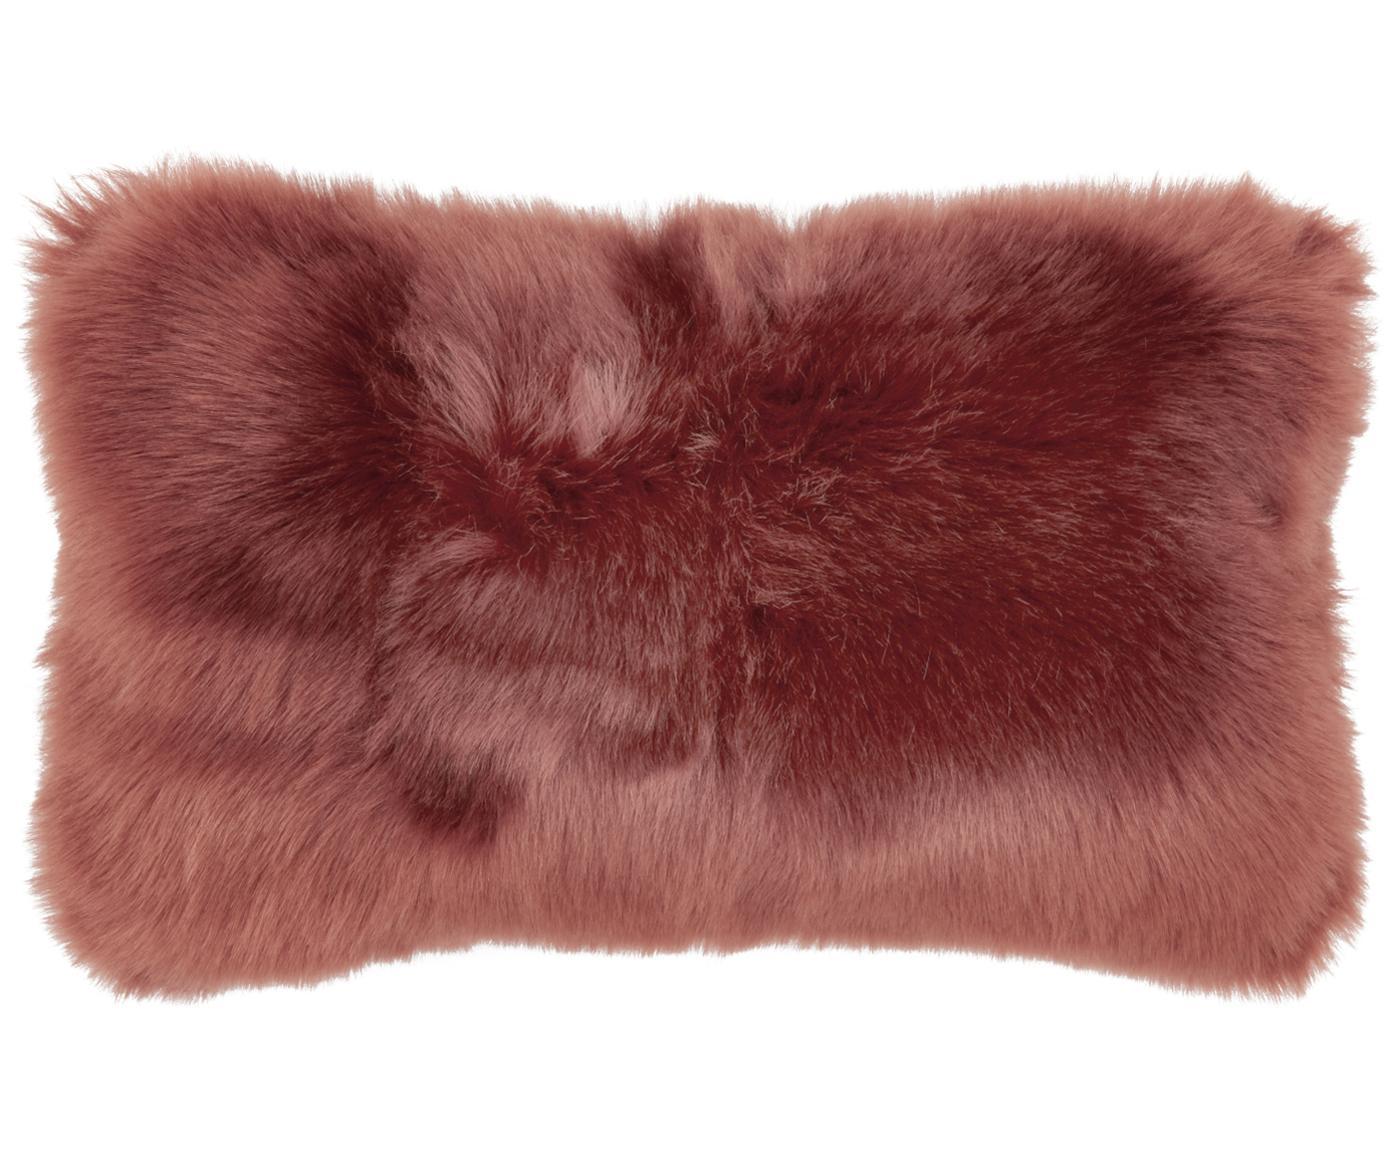 Flauschige Kunstfell-Kissenhülle Mathilde, glatt, Vorderseite: 67% Akryl, 33% Polyester, Rückseite: 100% Polyester, Terrakotta, 30 x 50 cm